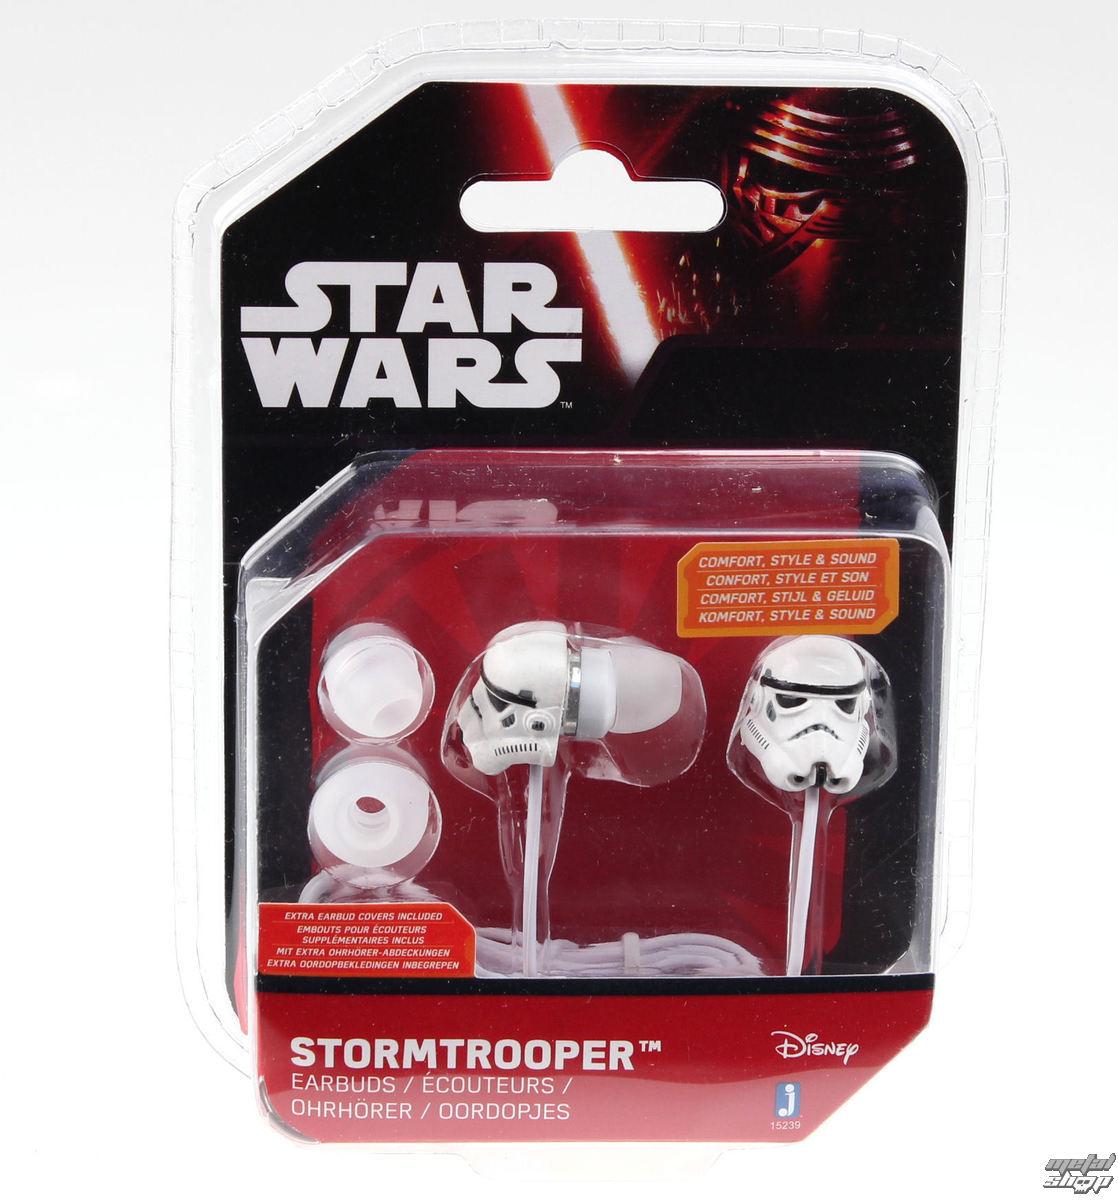 sluchátka Star Wars - Stormtrooper - Wht - JAZ15230(3)